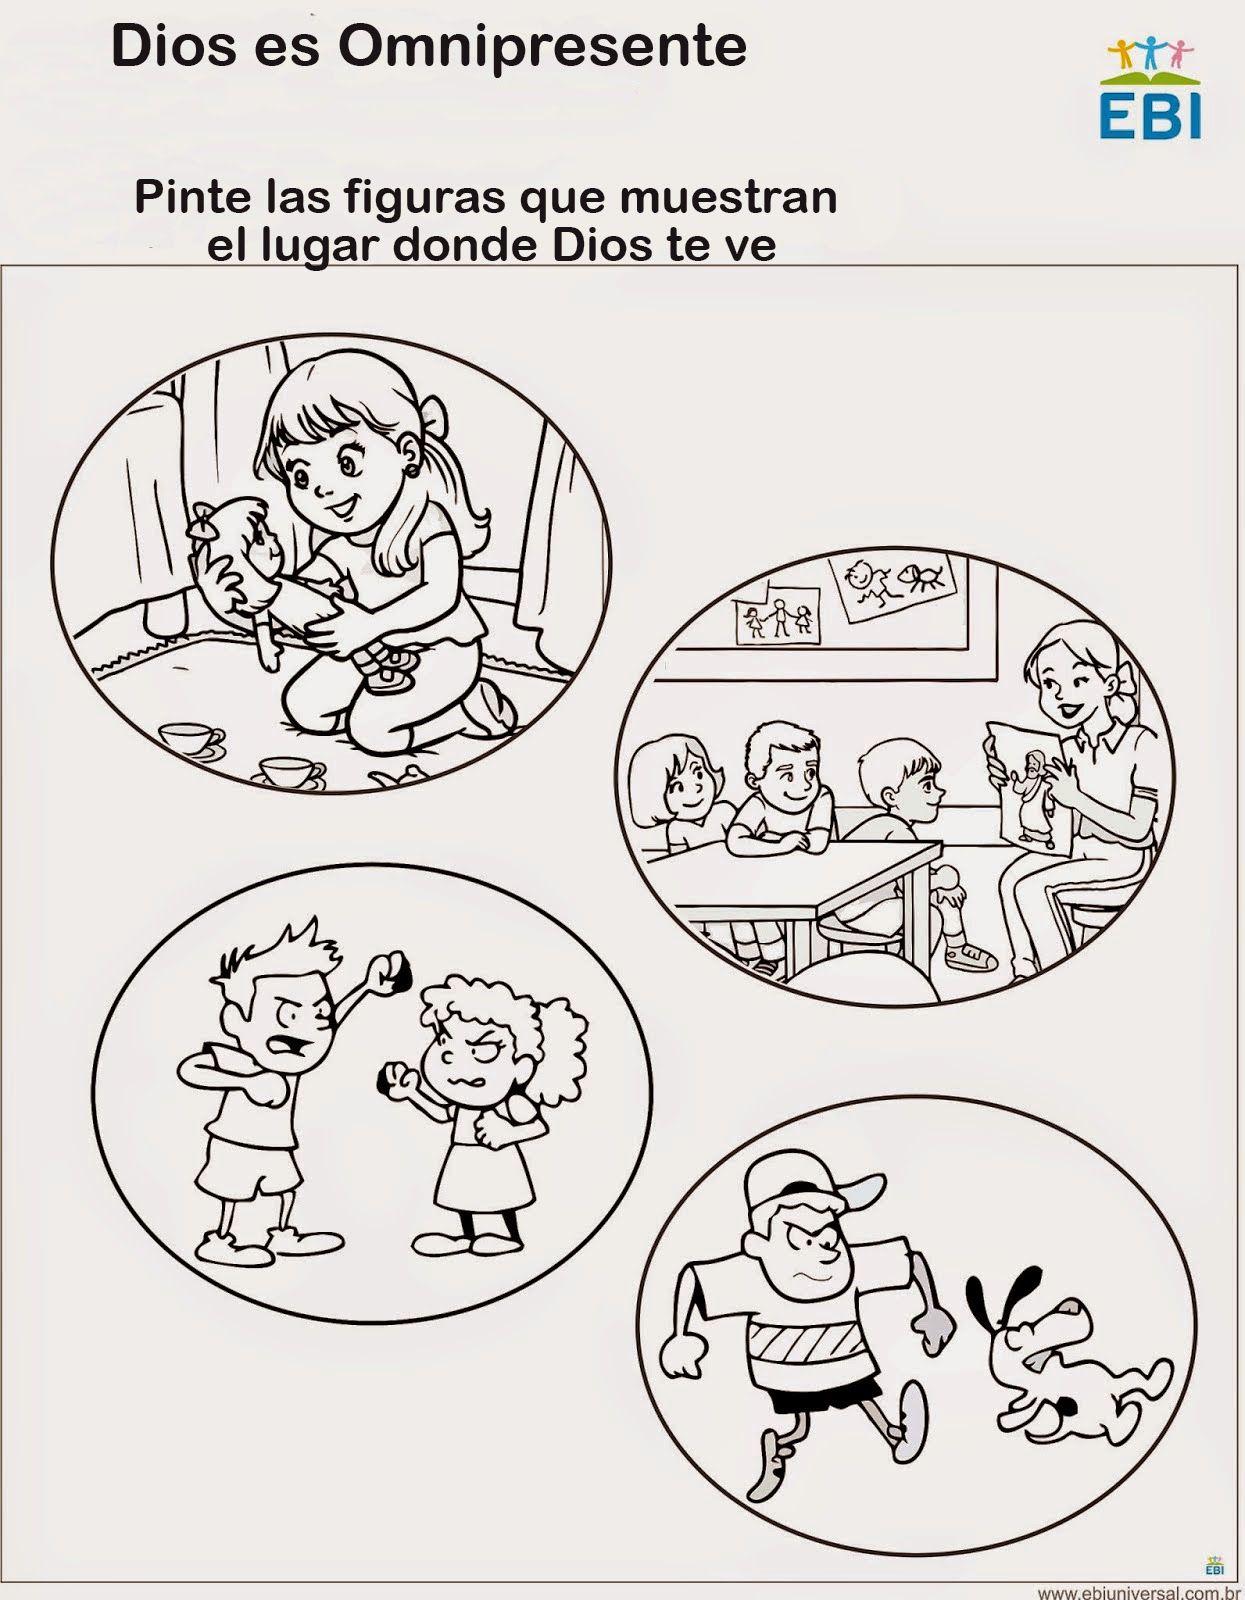 Dios es omnipresente.. | Воскресная школа - MISC | Pinterest | Dios ...